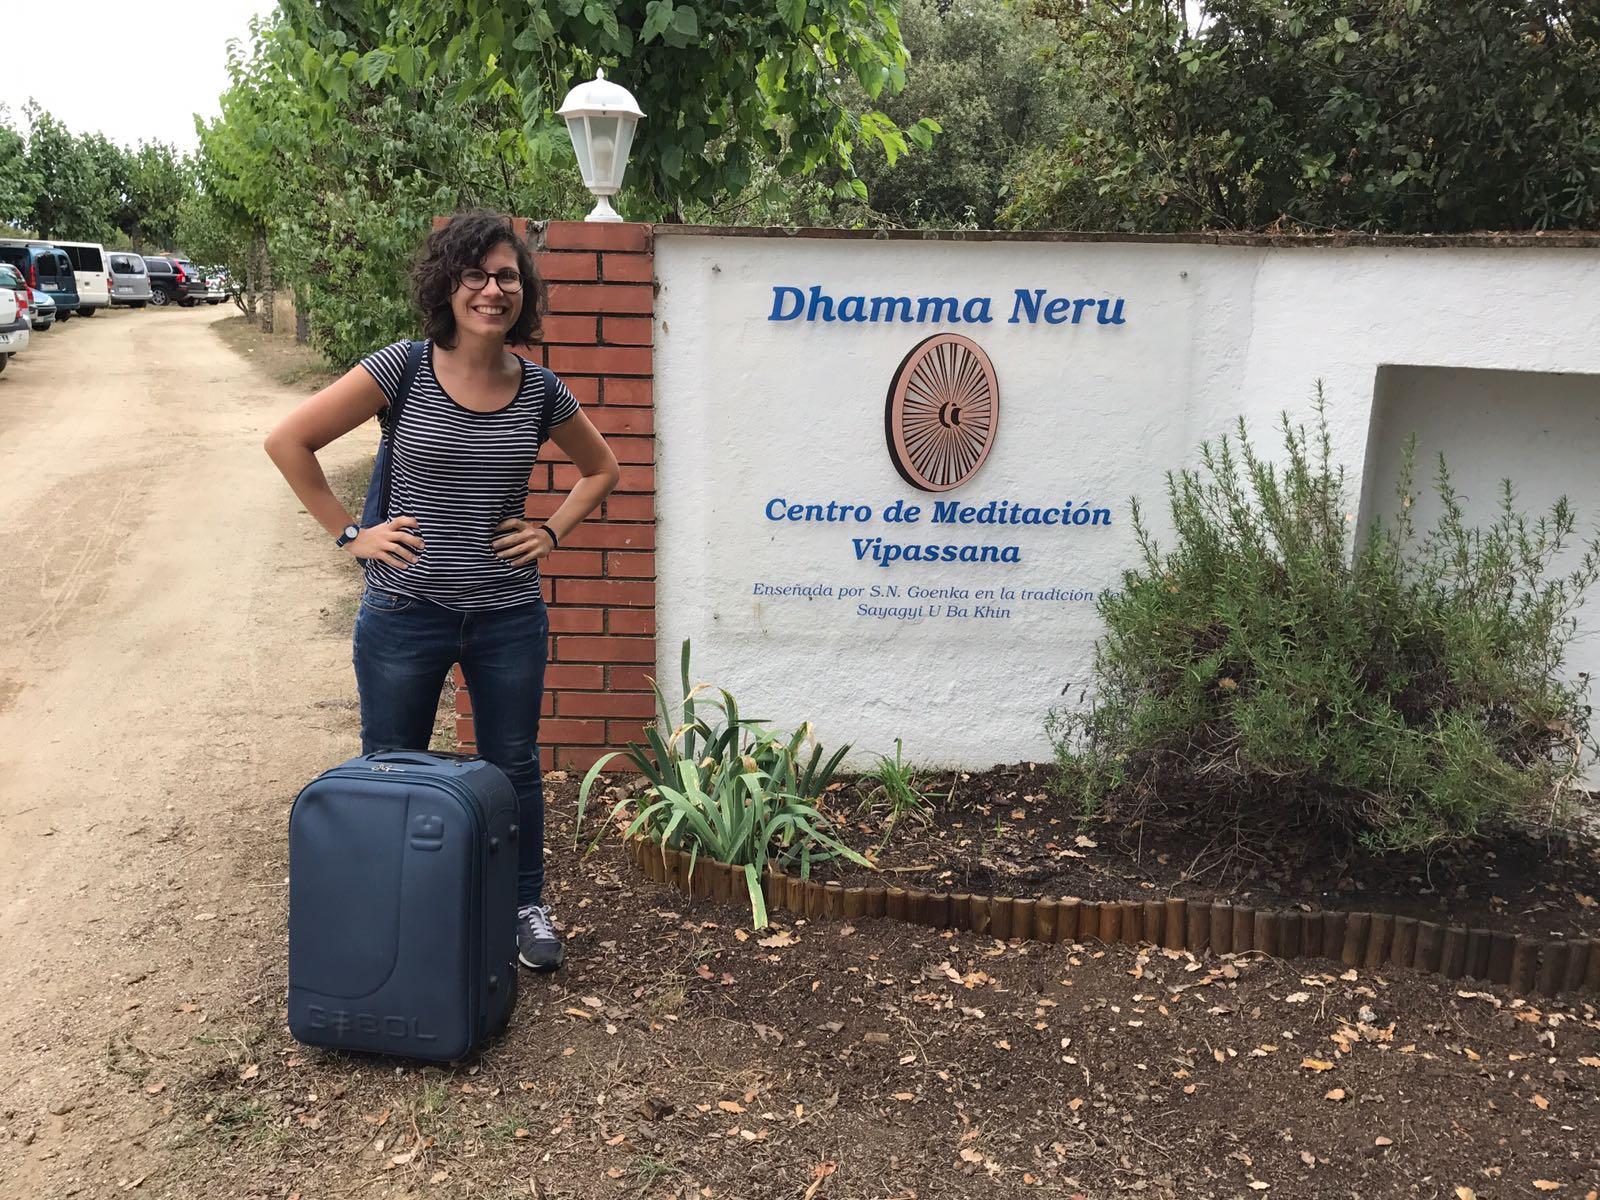 ritiro vipassana_blog di viaggi eDreams